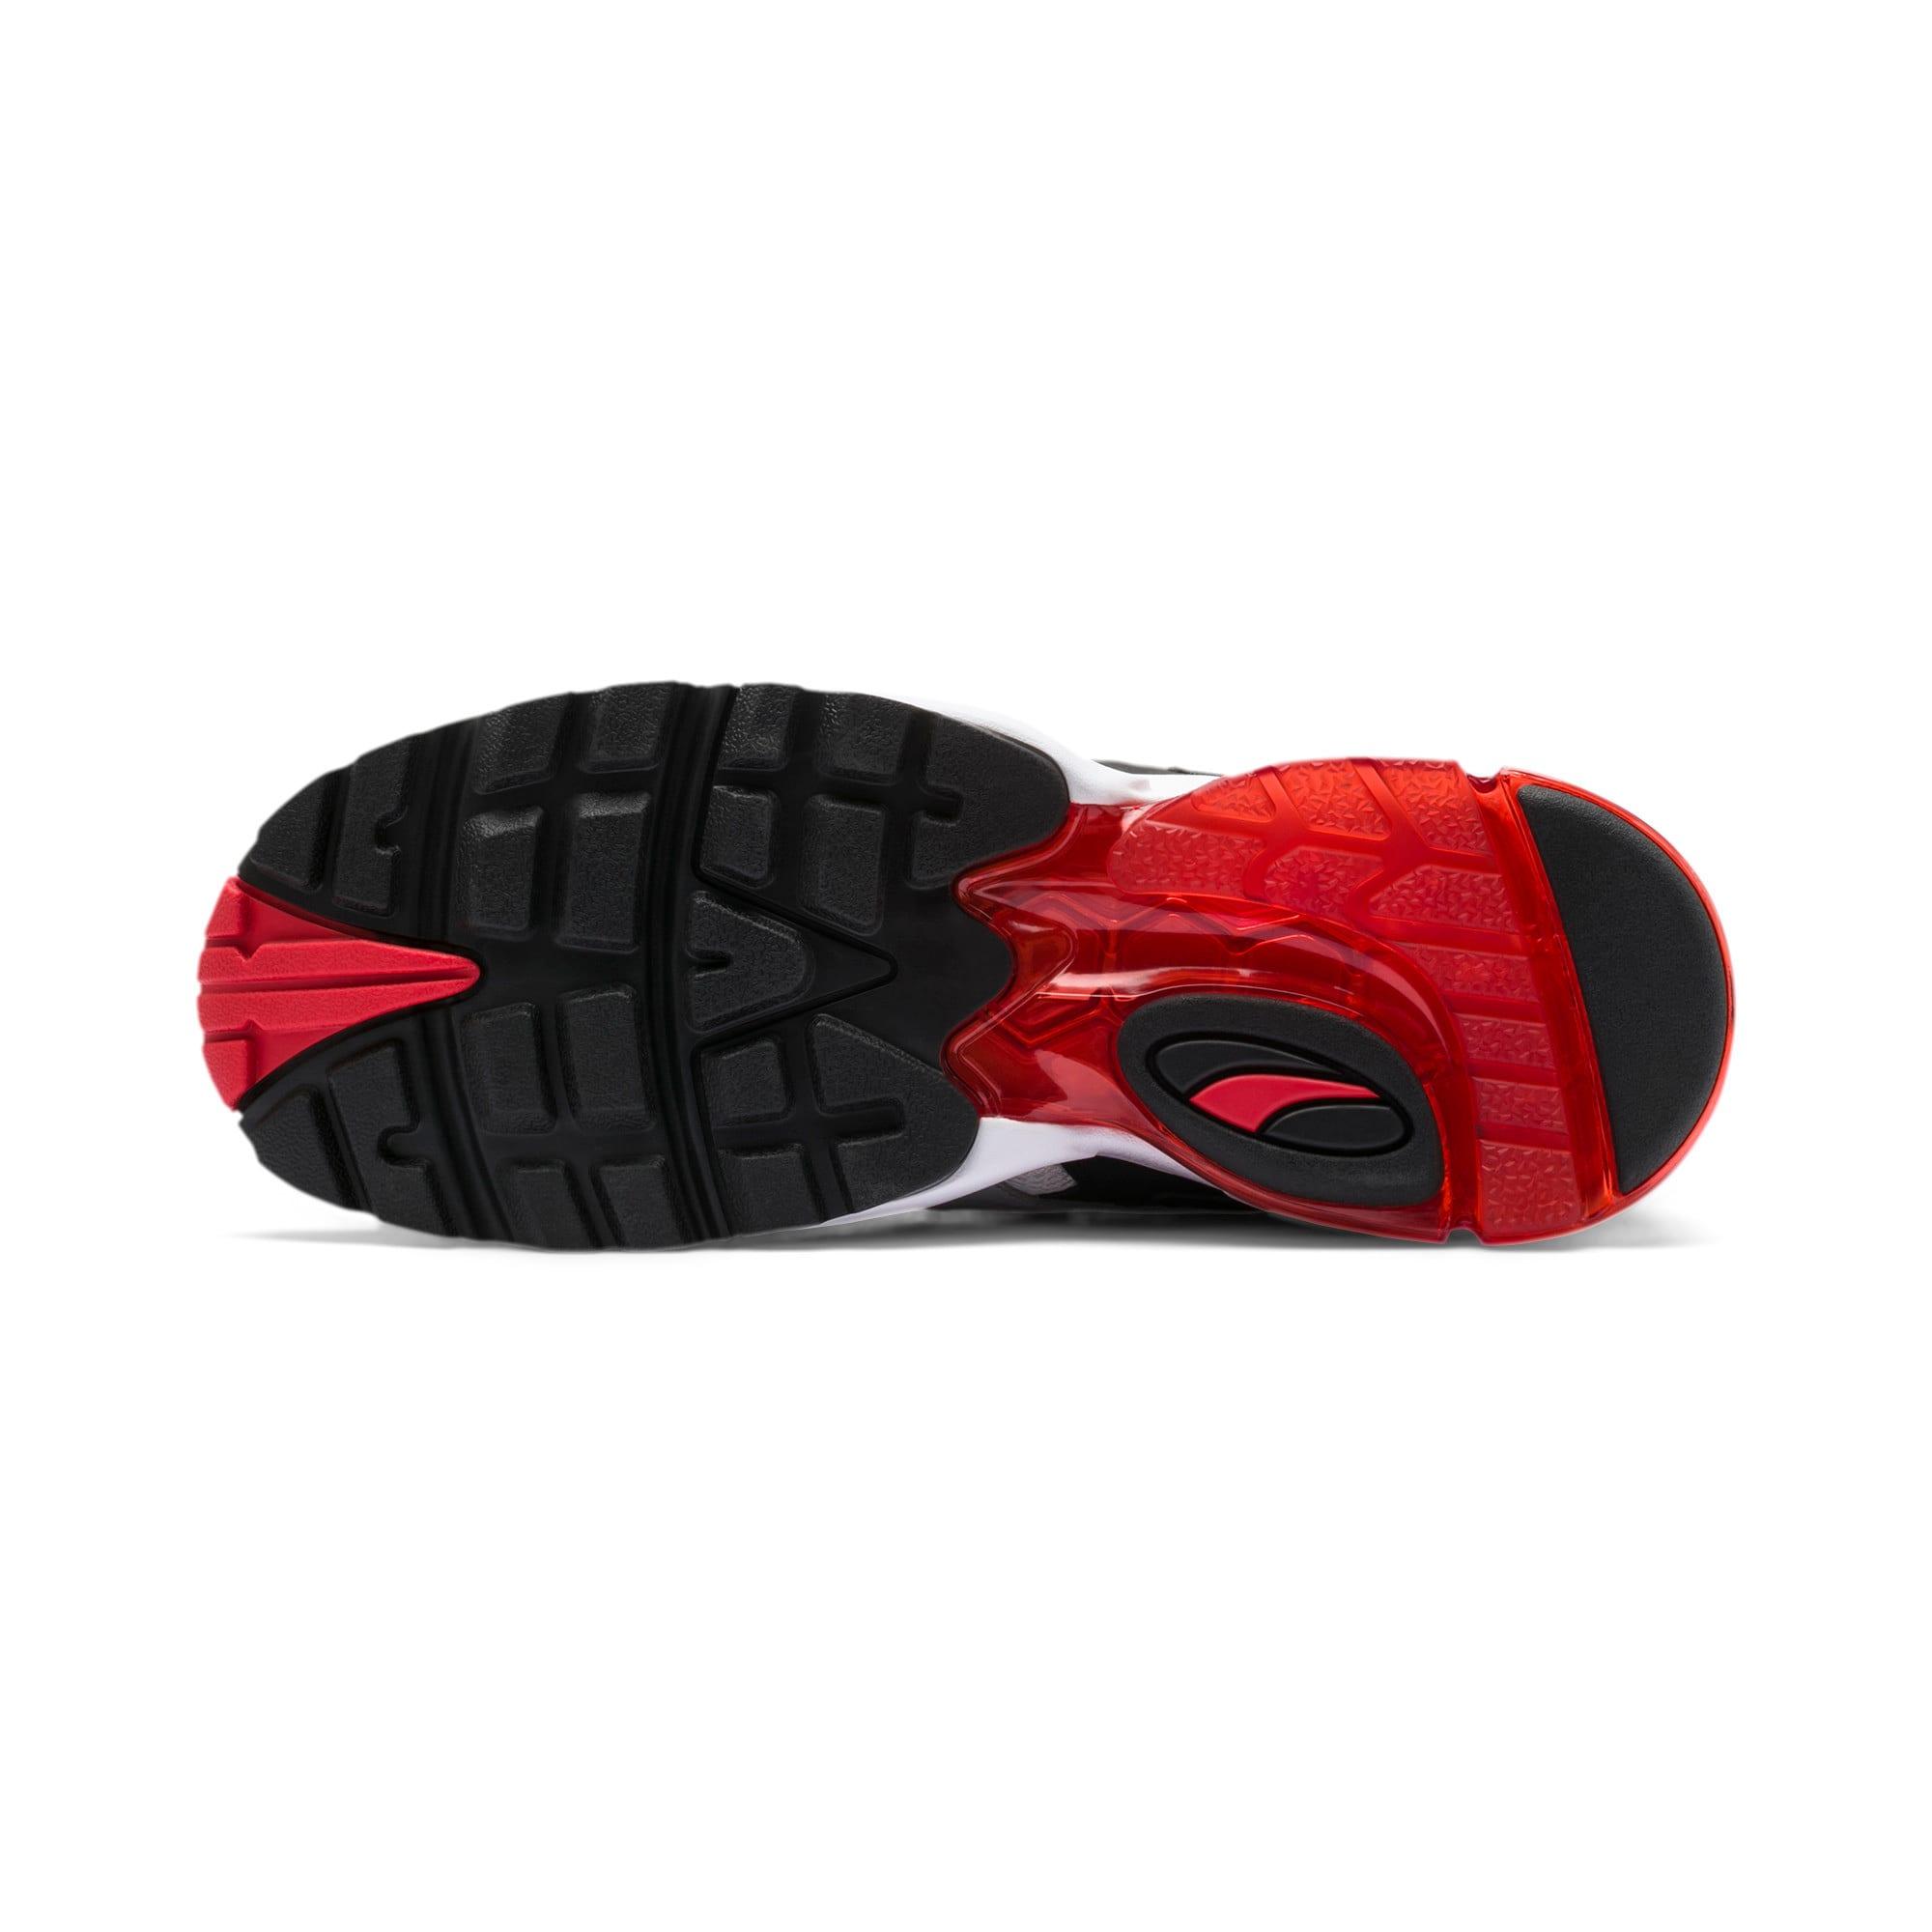 Thumbnail 5 of CELL Alien OG sportschoenen, Puma Black-High Risk Red, medium